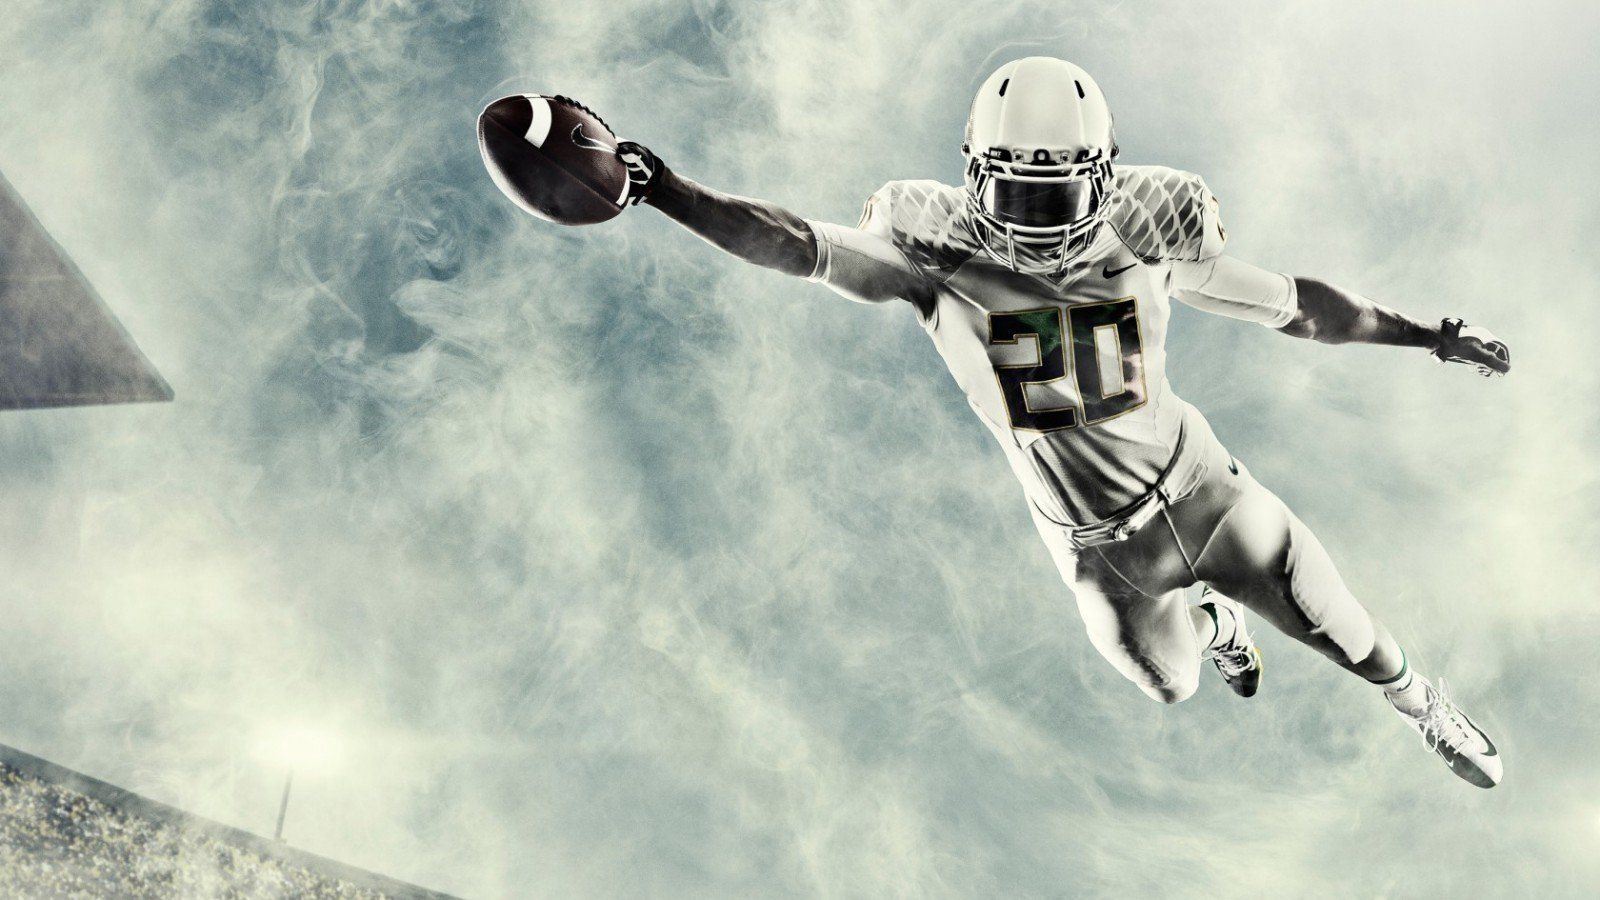 1920x1080 HD Wallpaper American Football